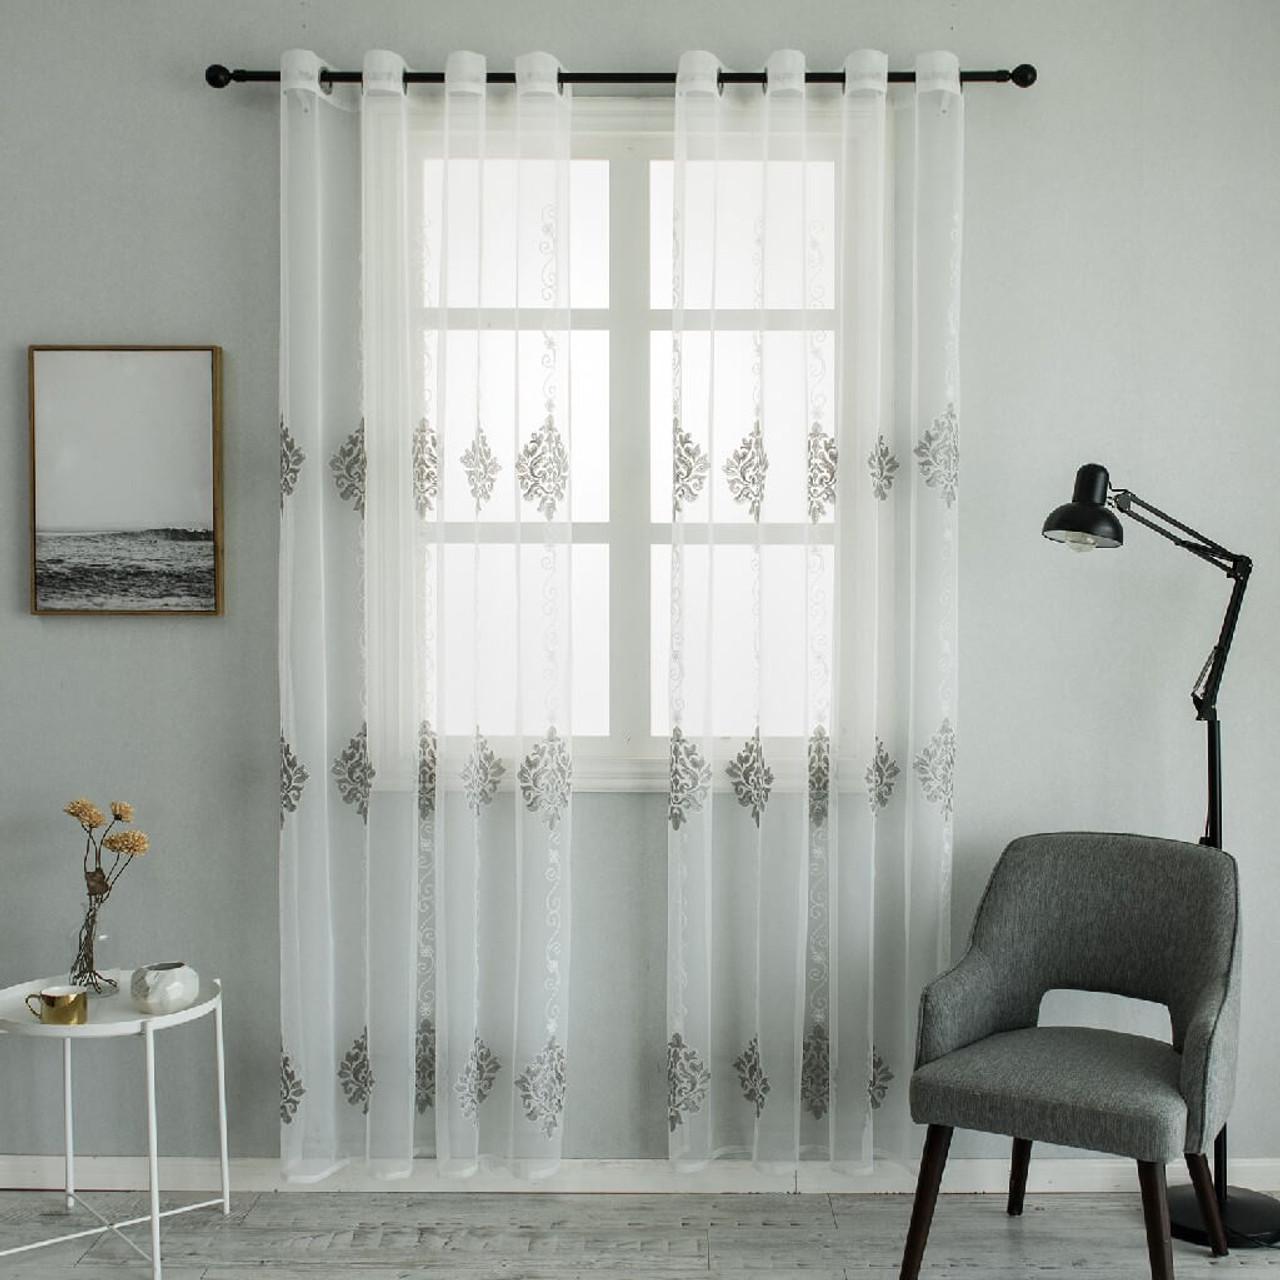 White Sheer Curtain Panels - Dolce mela - Nexus - DMC721